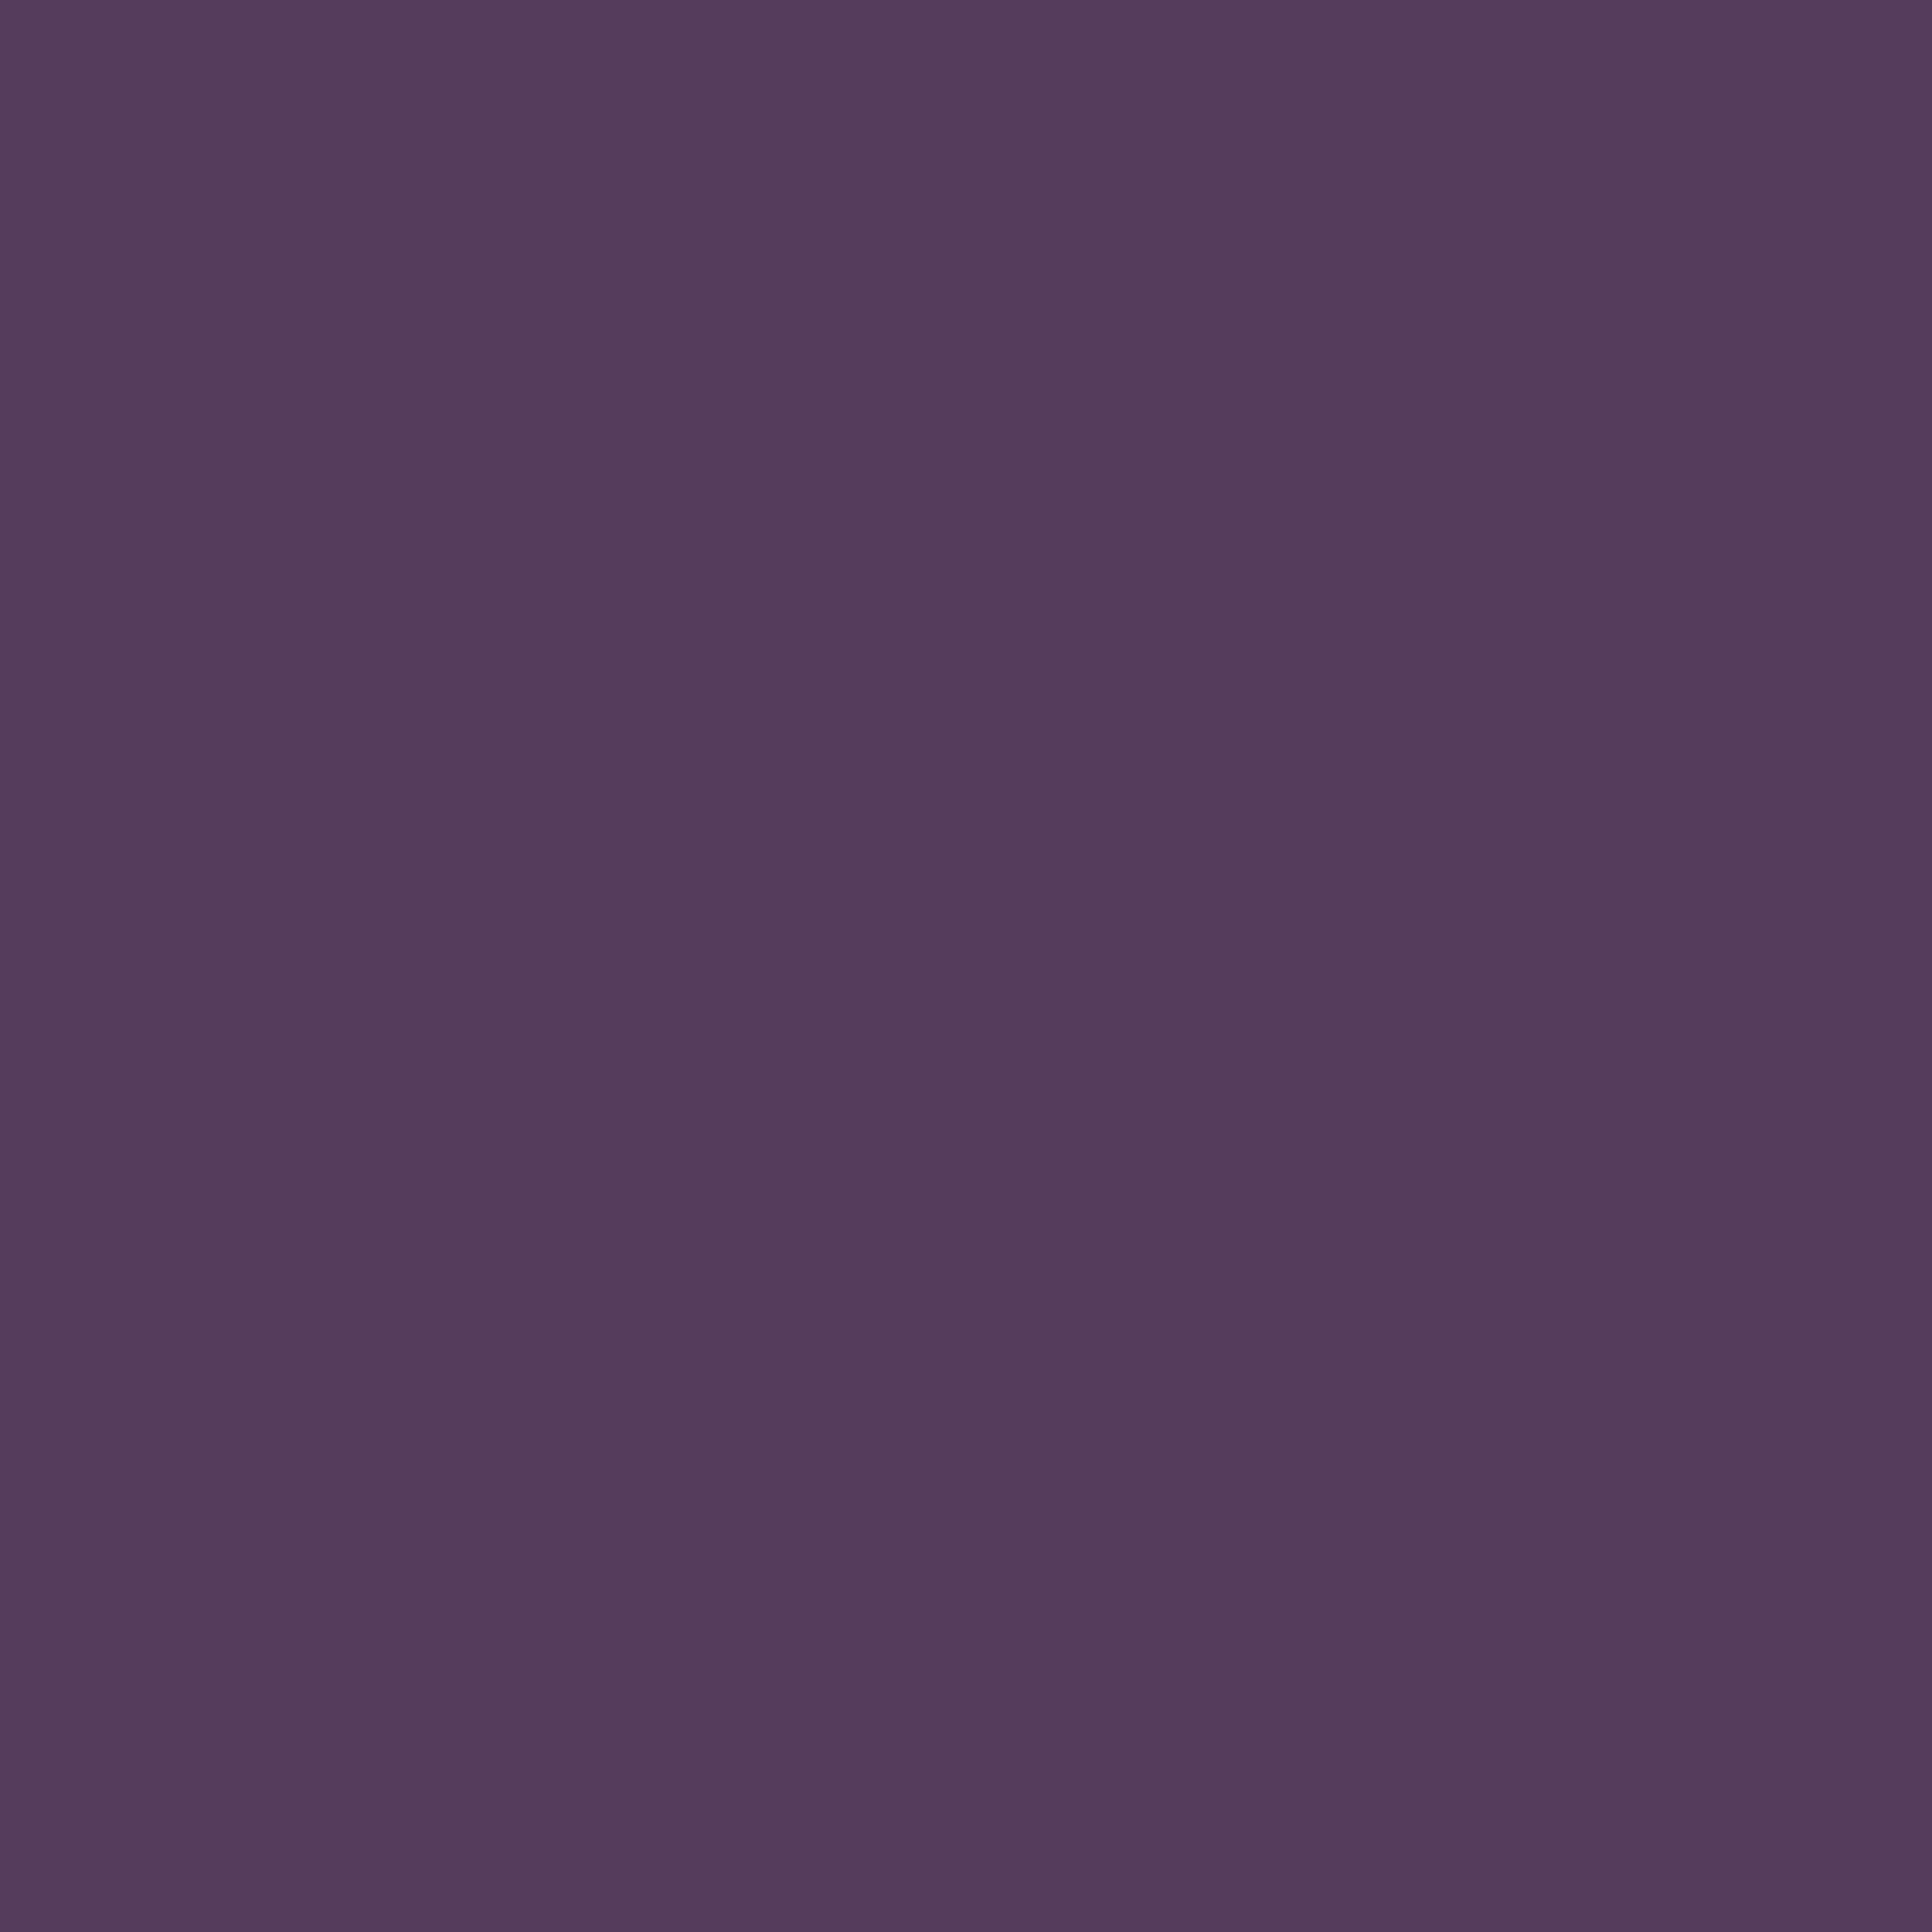 3600x3600 English Violet Solid Color Background